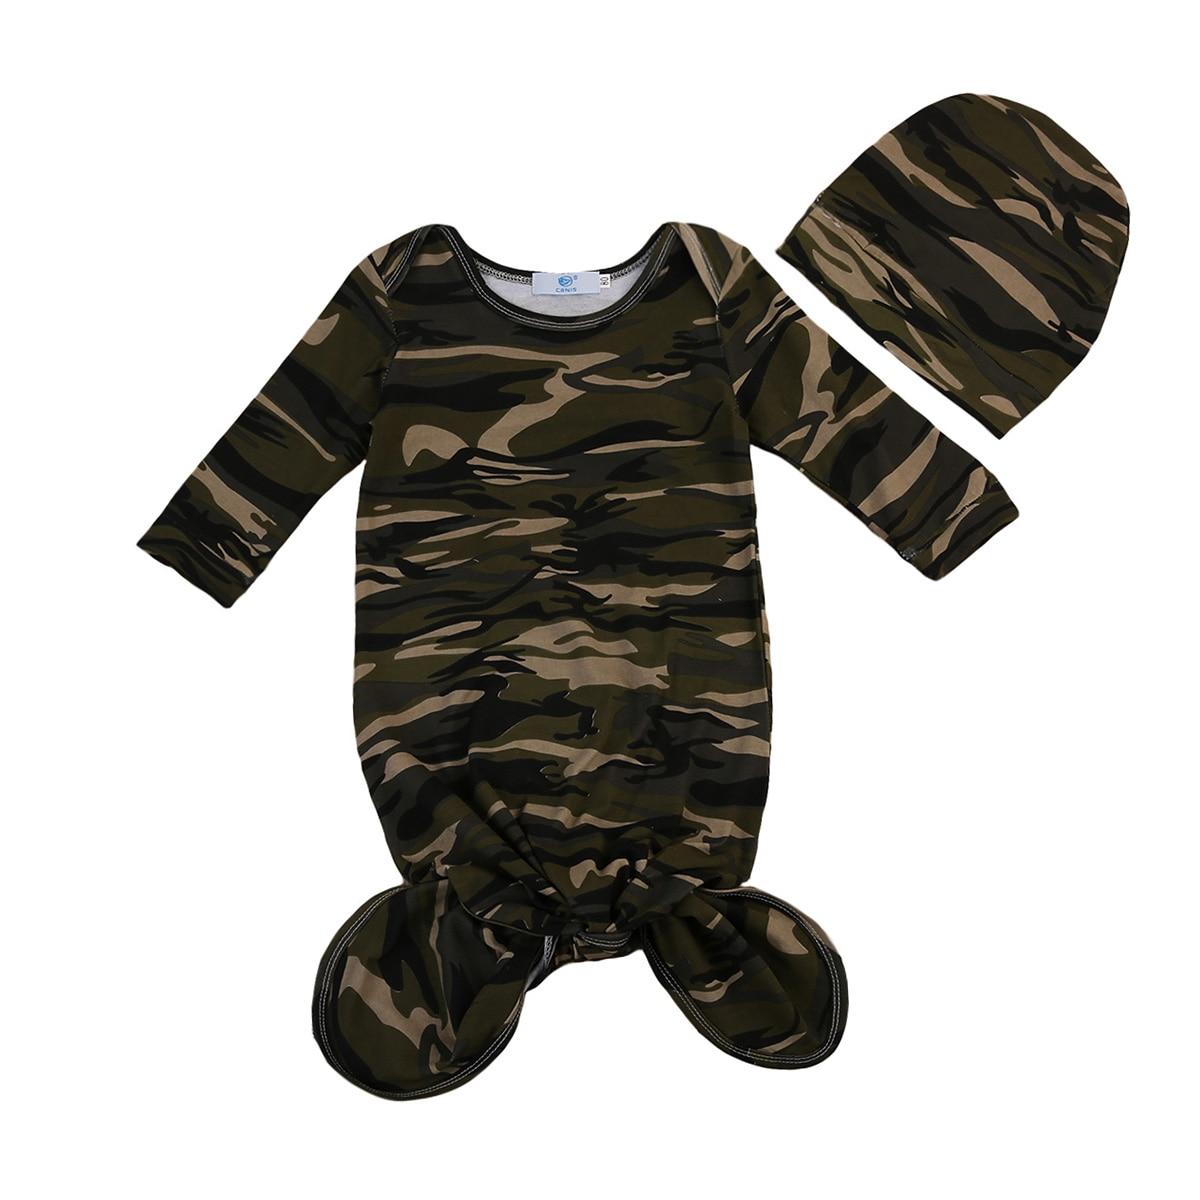 Newborn Infant Baby Camouflage Sleeper Newborn Kids Sleeping Bag